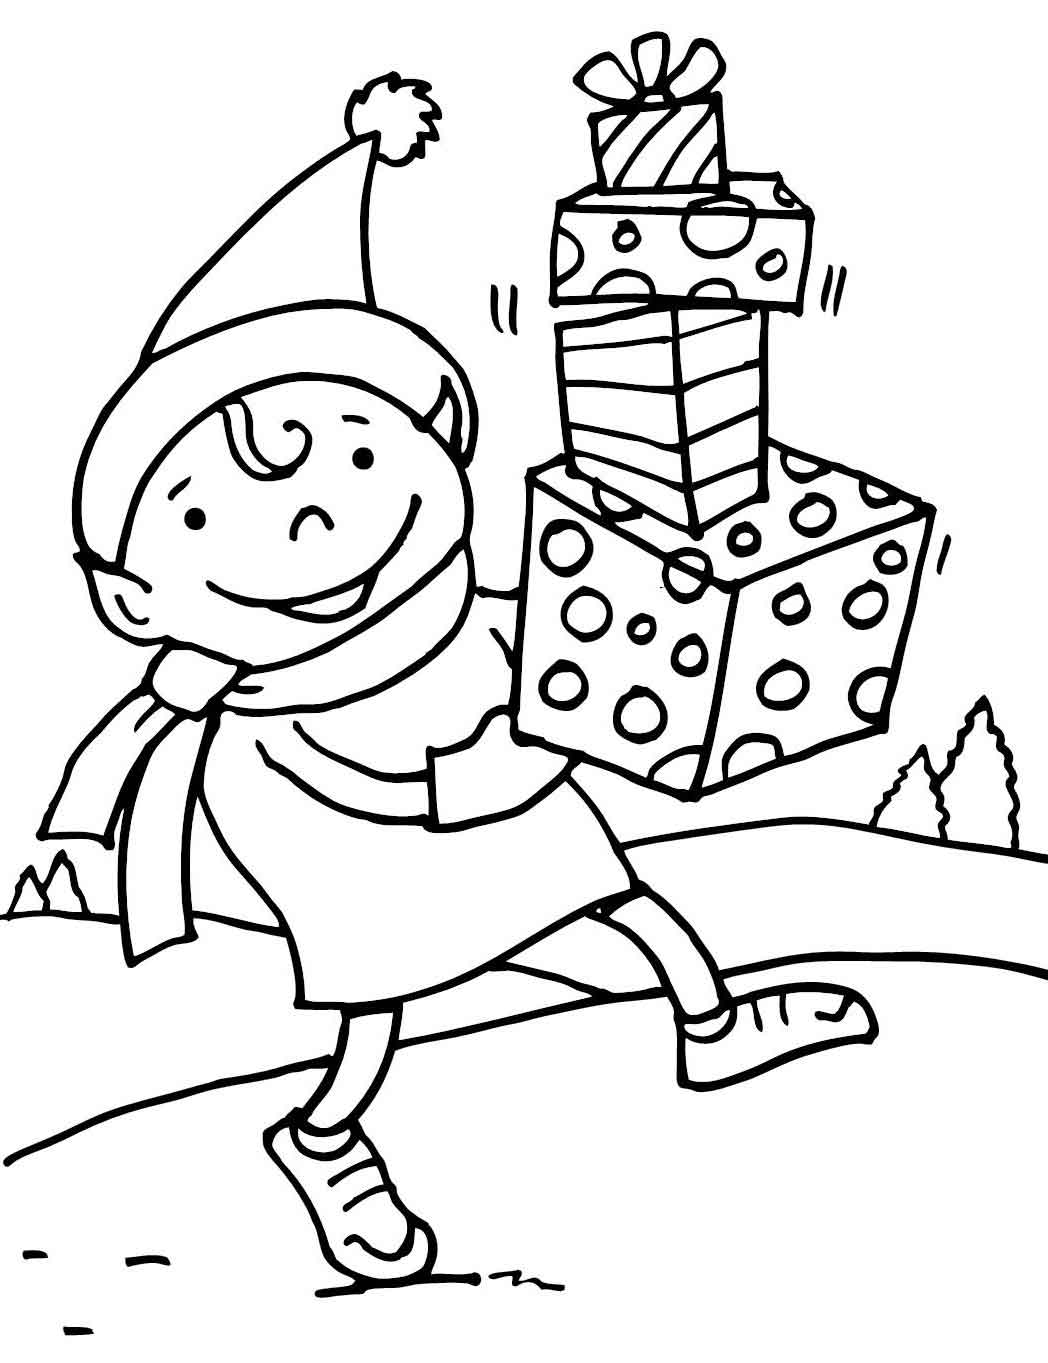 Christmas Elf Coloring Pages Printable at GetDrawings ...